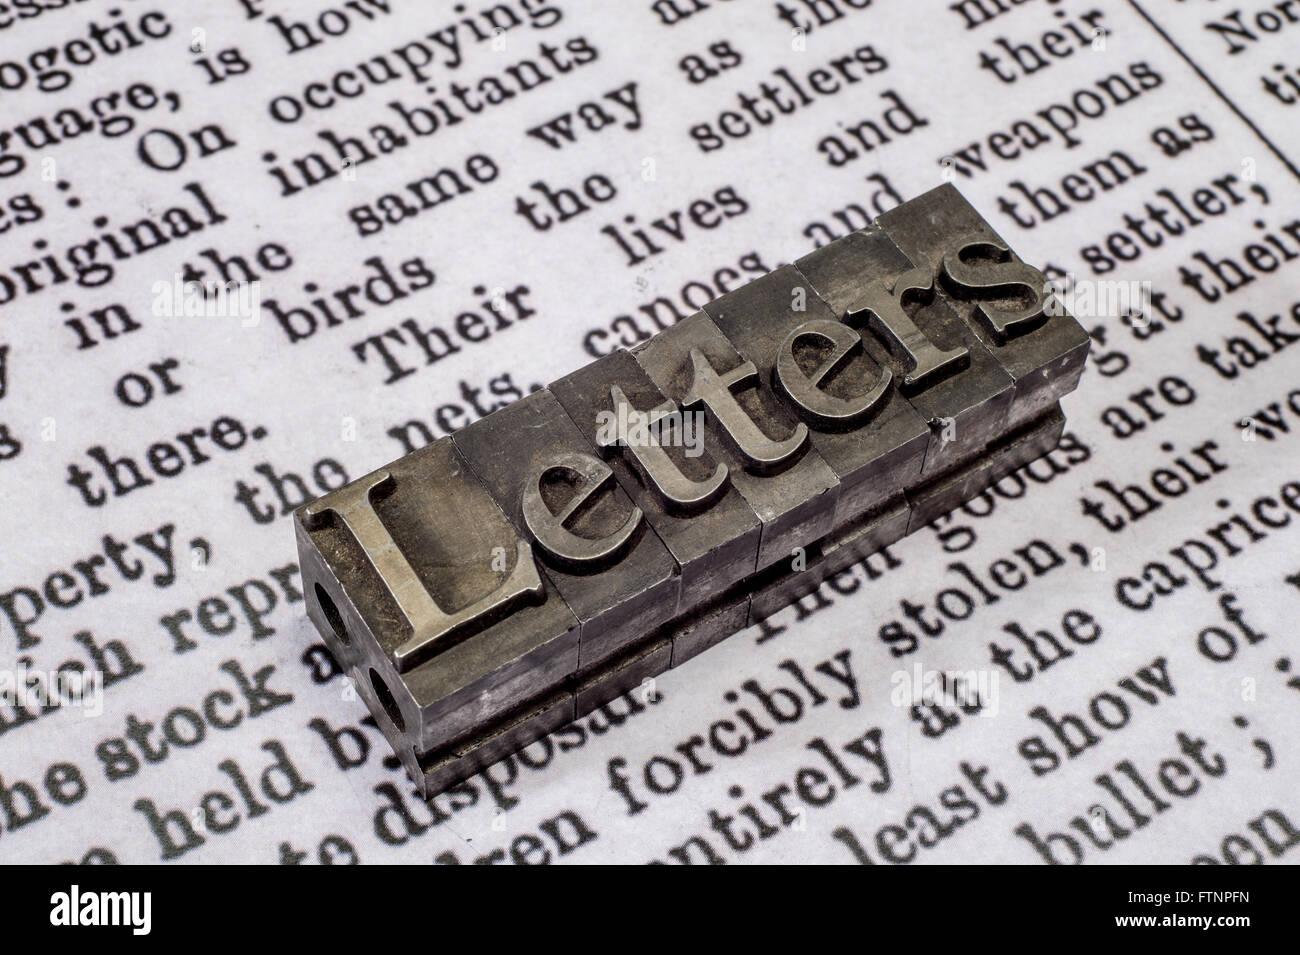 Printing press block letters on newspaper print arranged to display